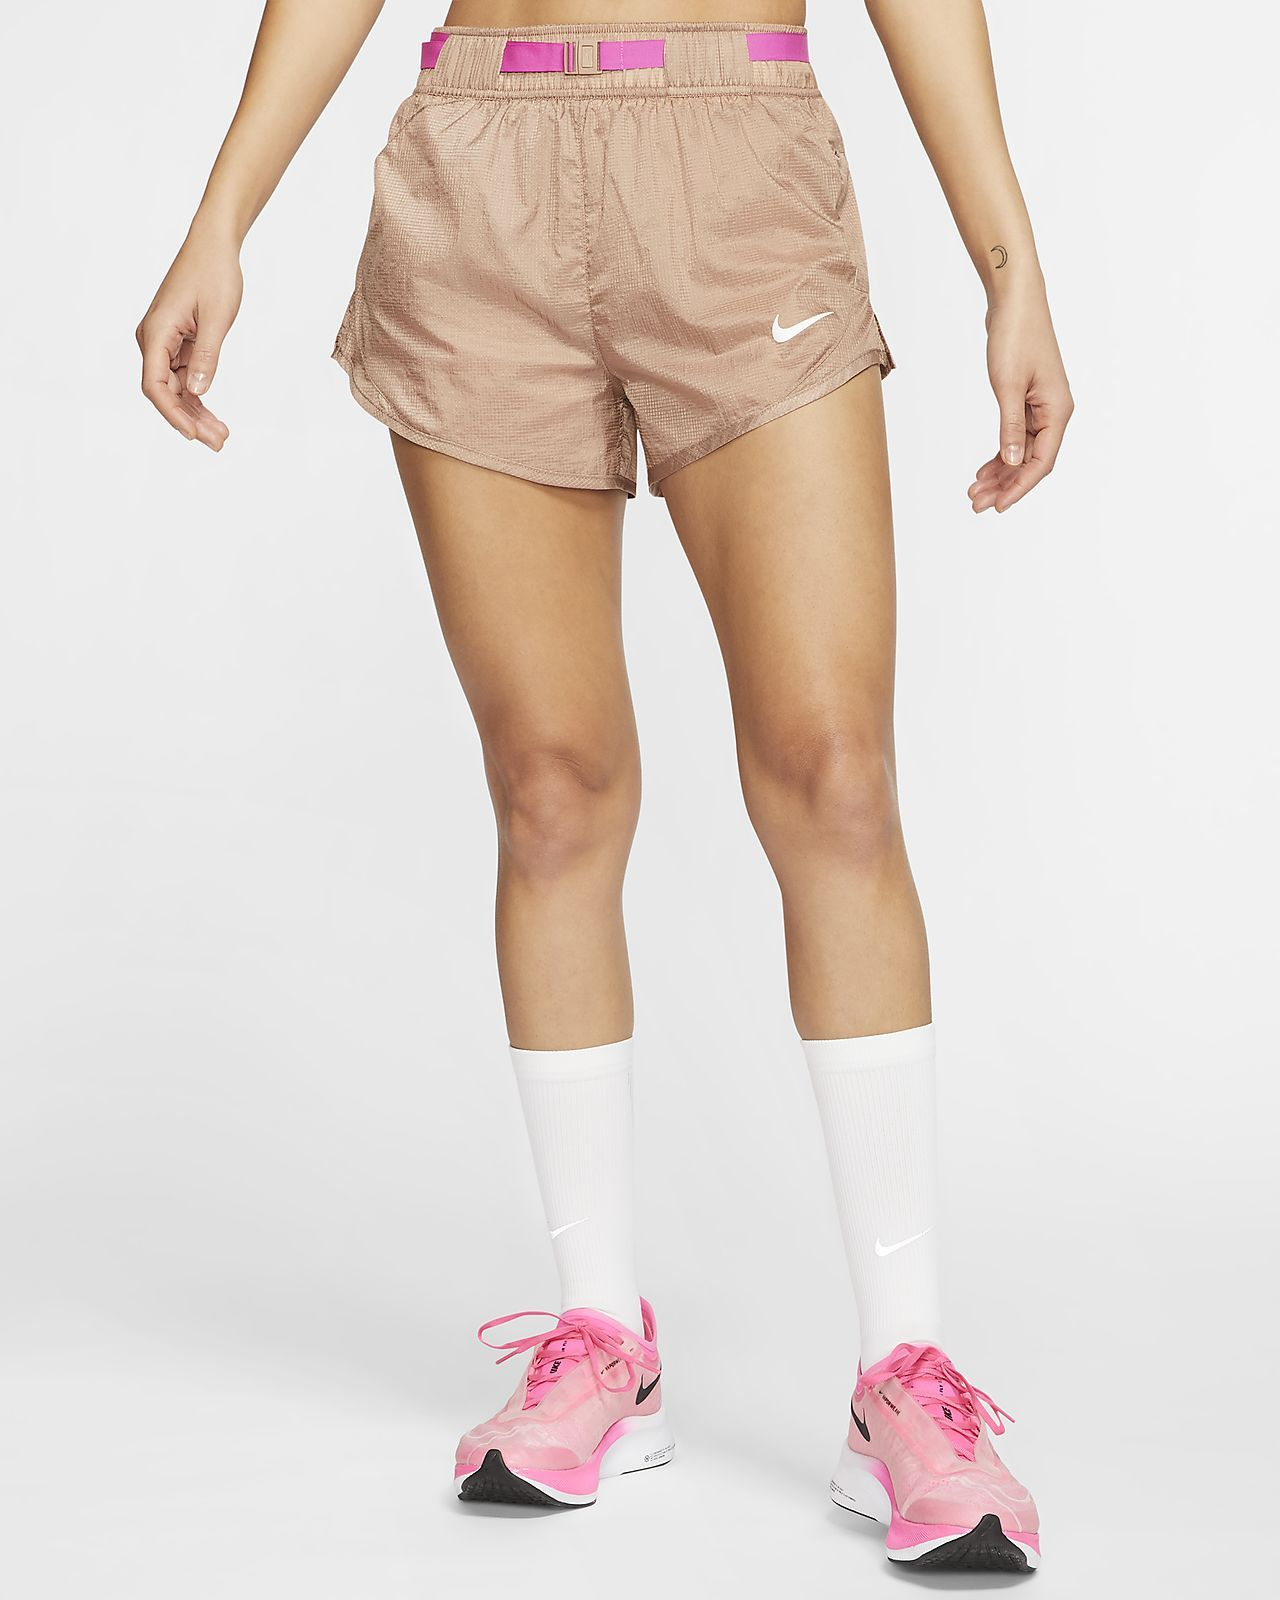 Nike Icon Clash Women's Running Shorts. in 2020